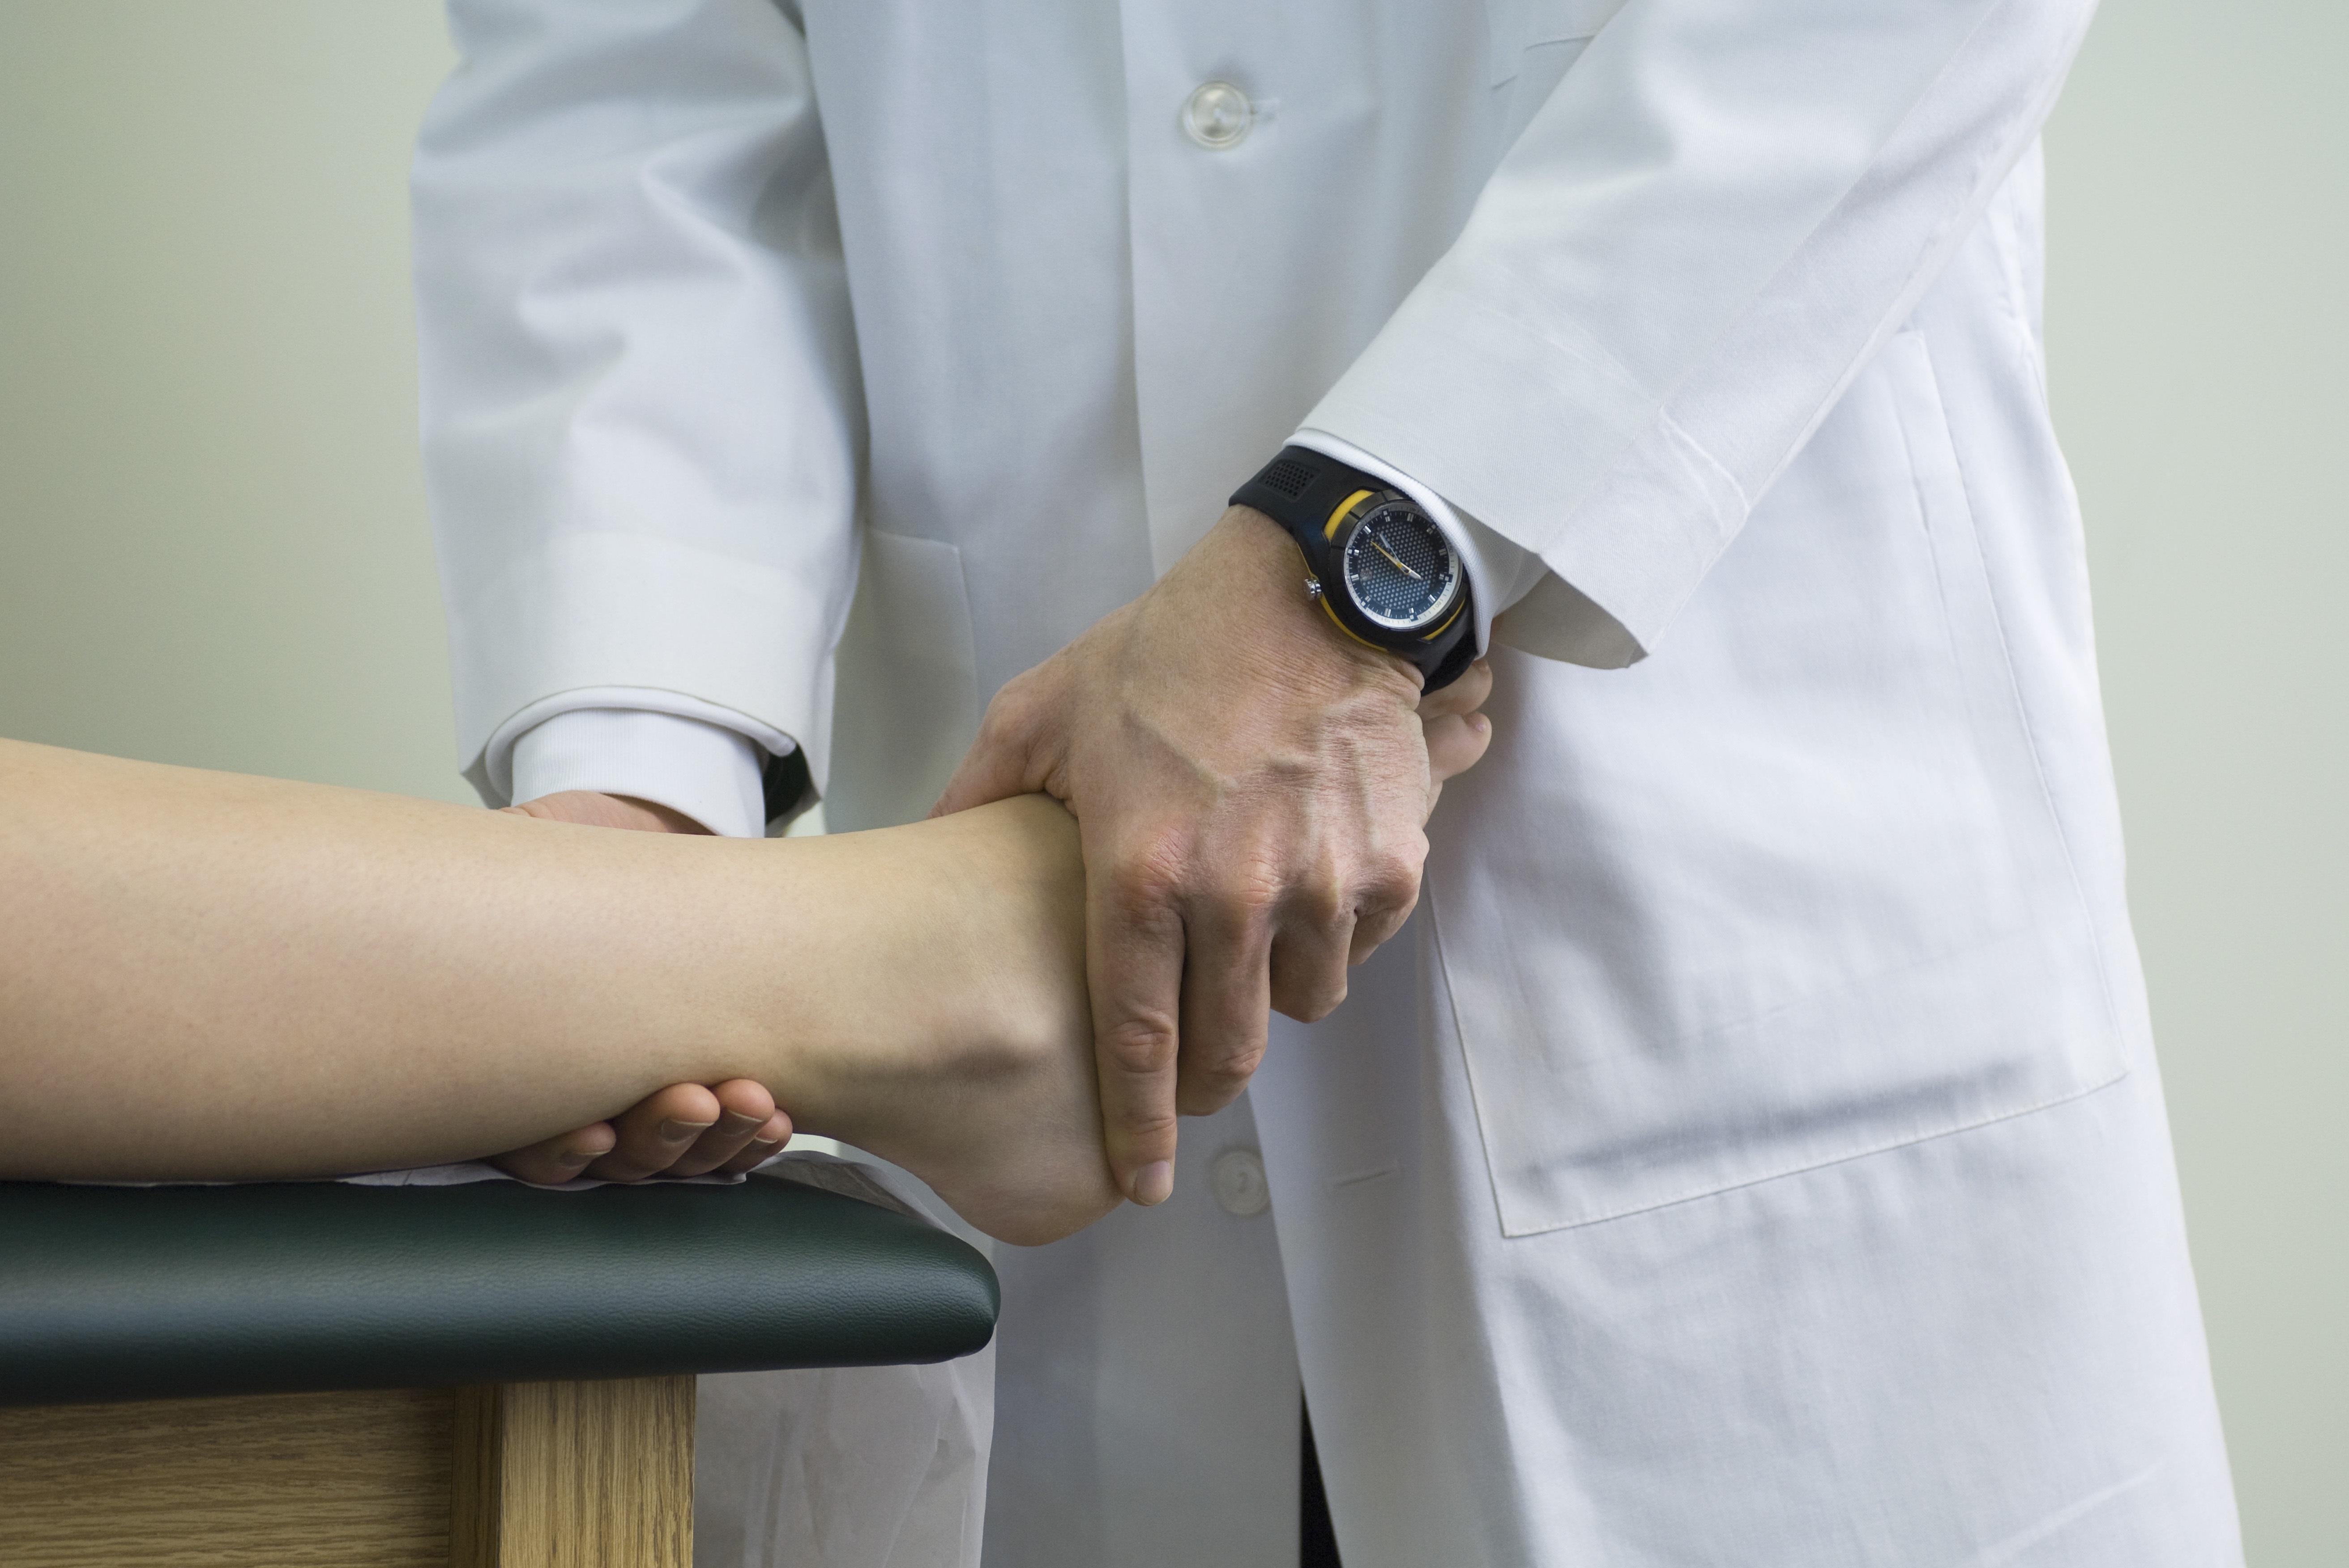 KU osteopath abused patient